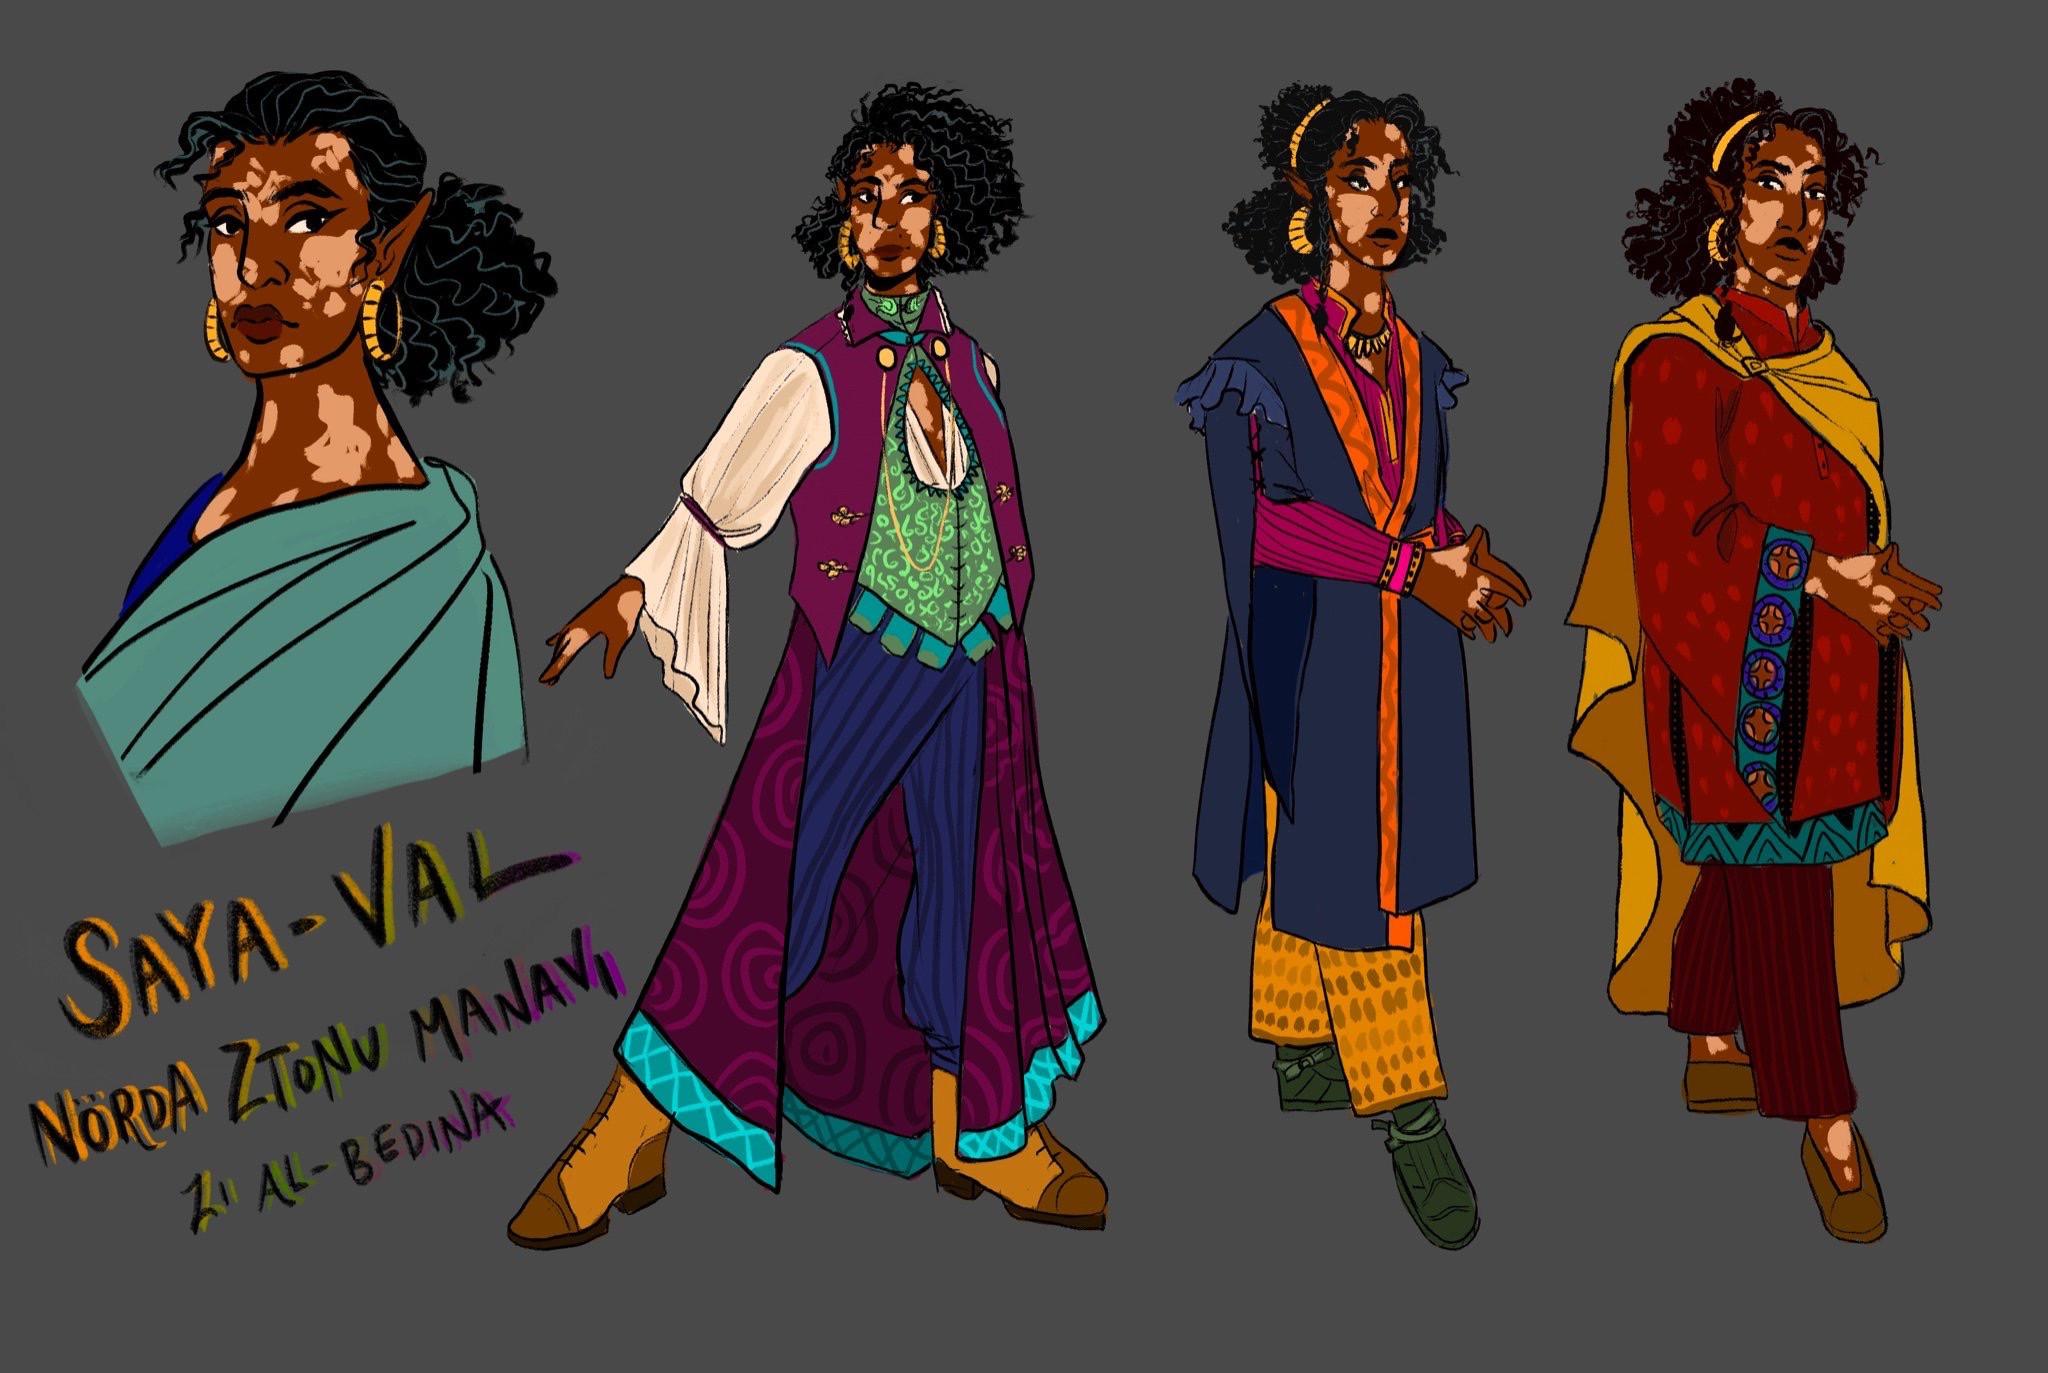 A closeup of Sample Outfits for Nörda Manavi